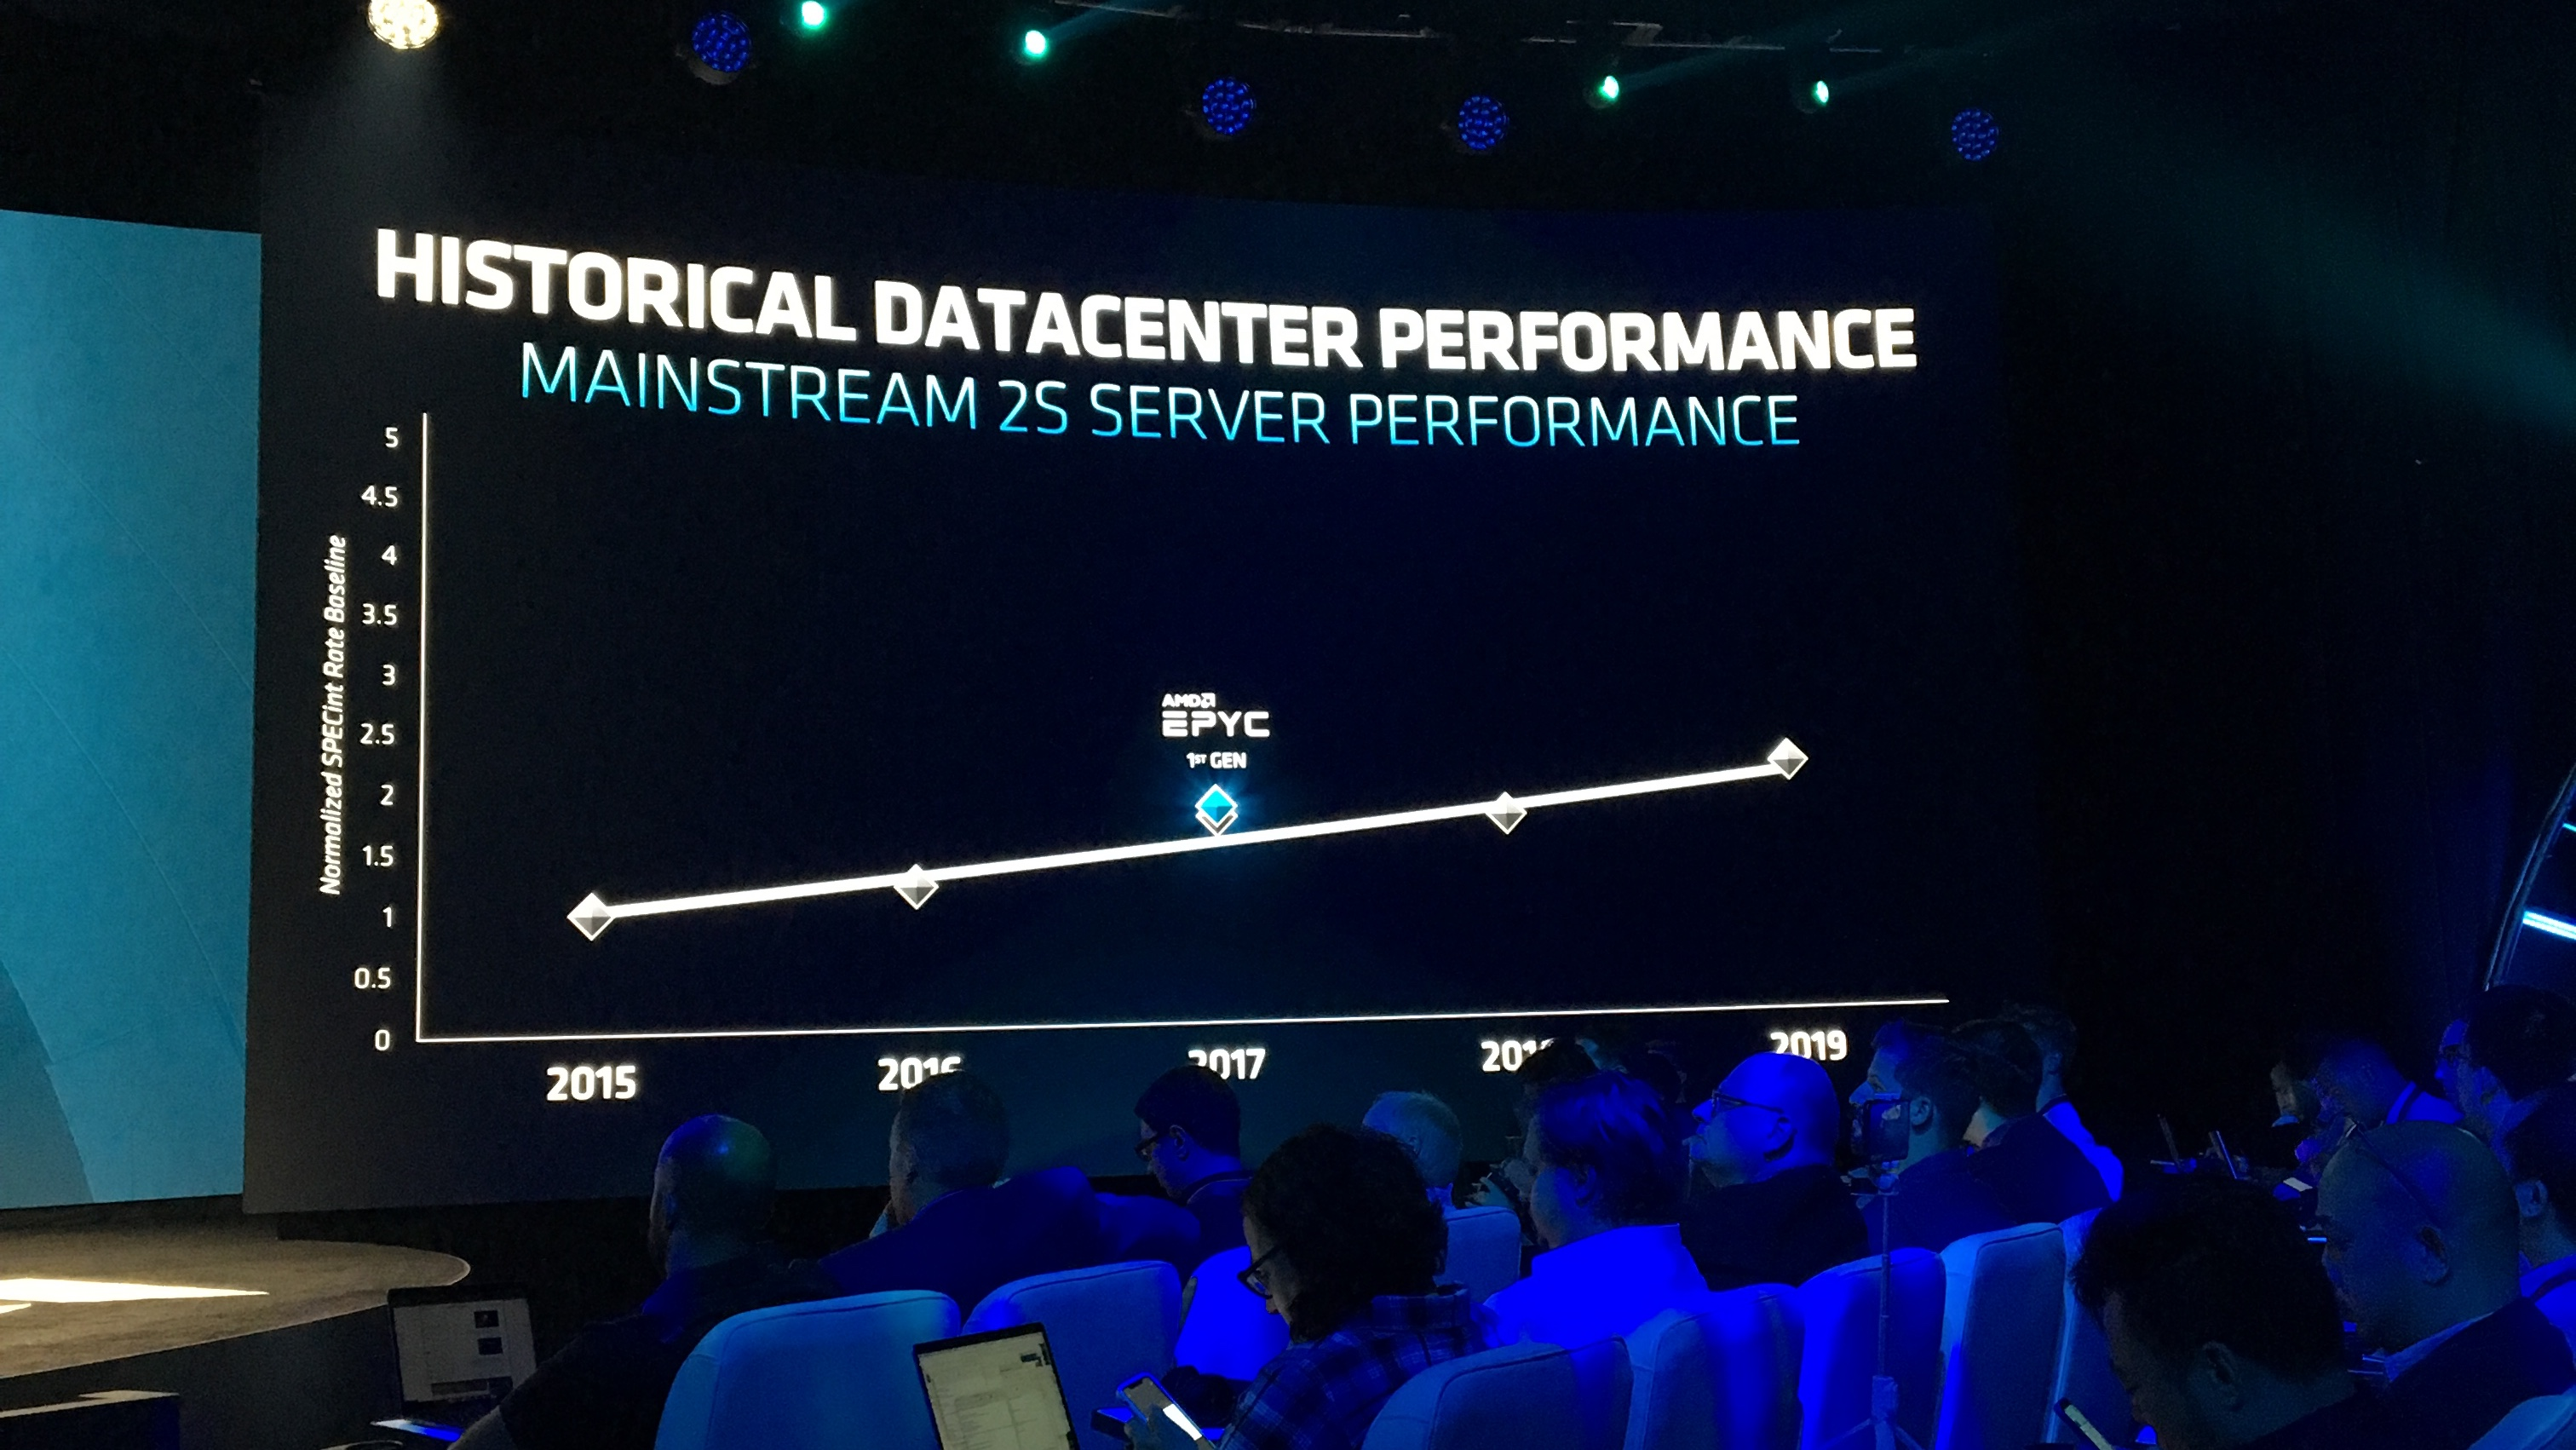 The AMD 2nd Gen EPYC